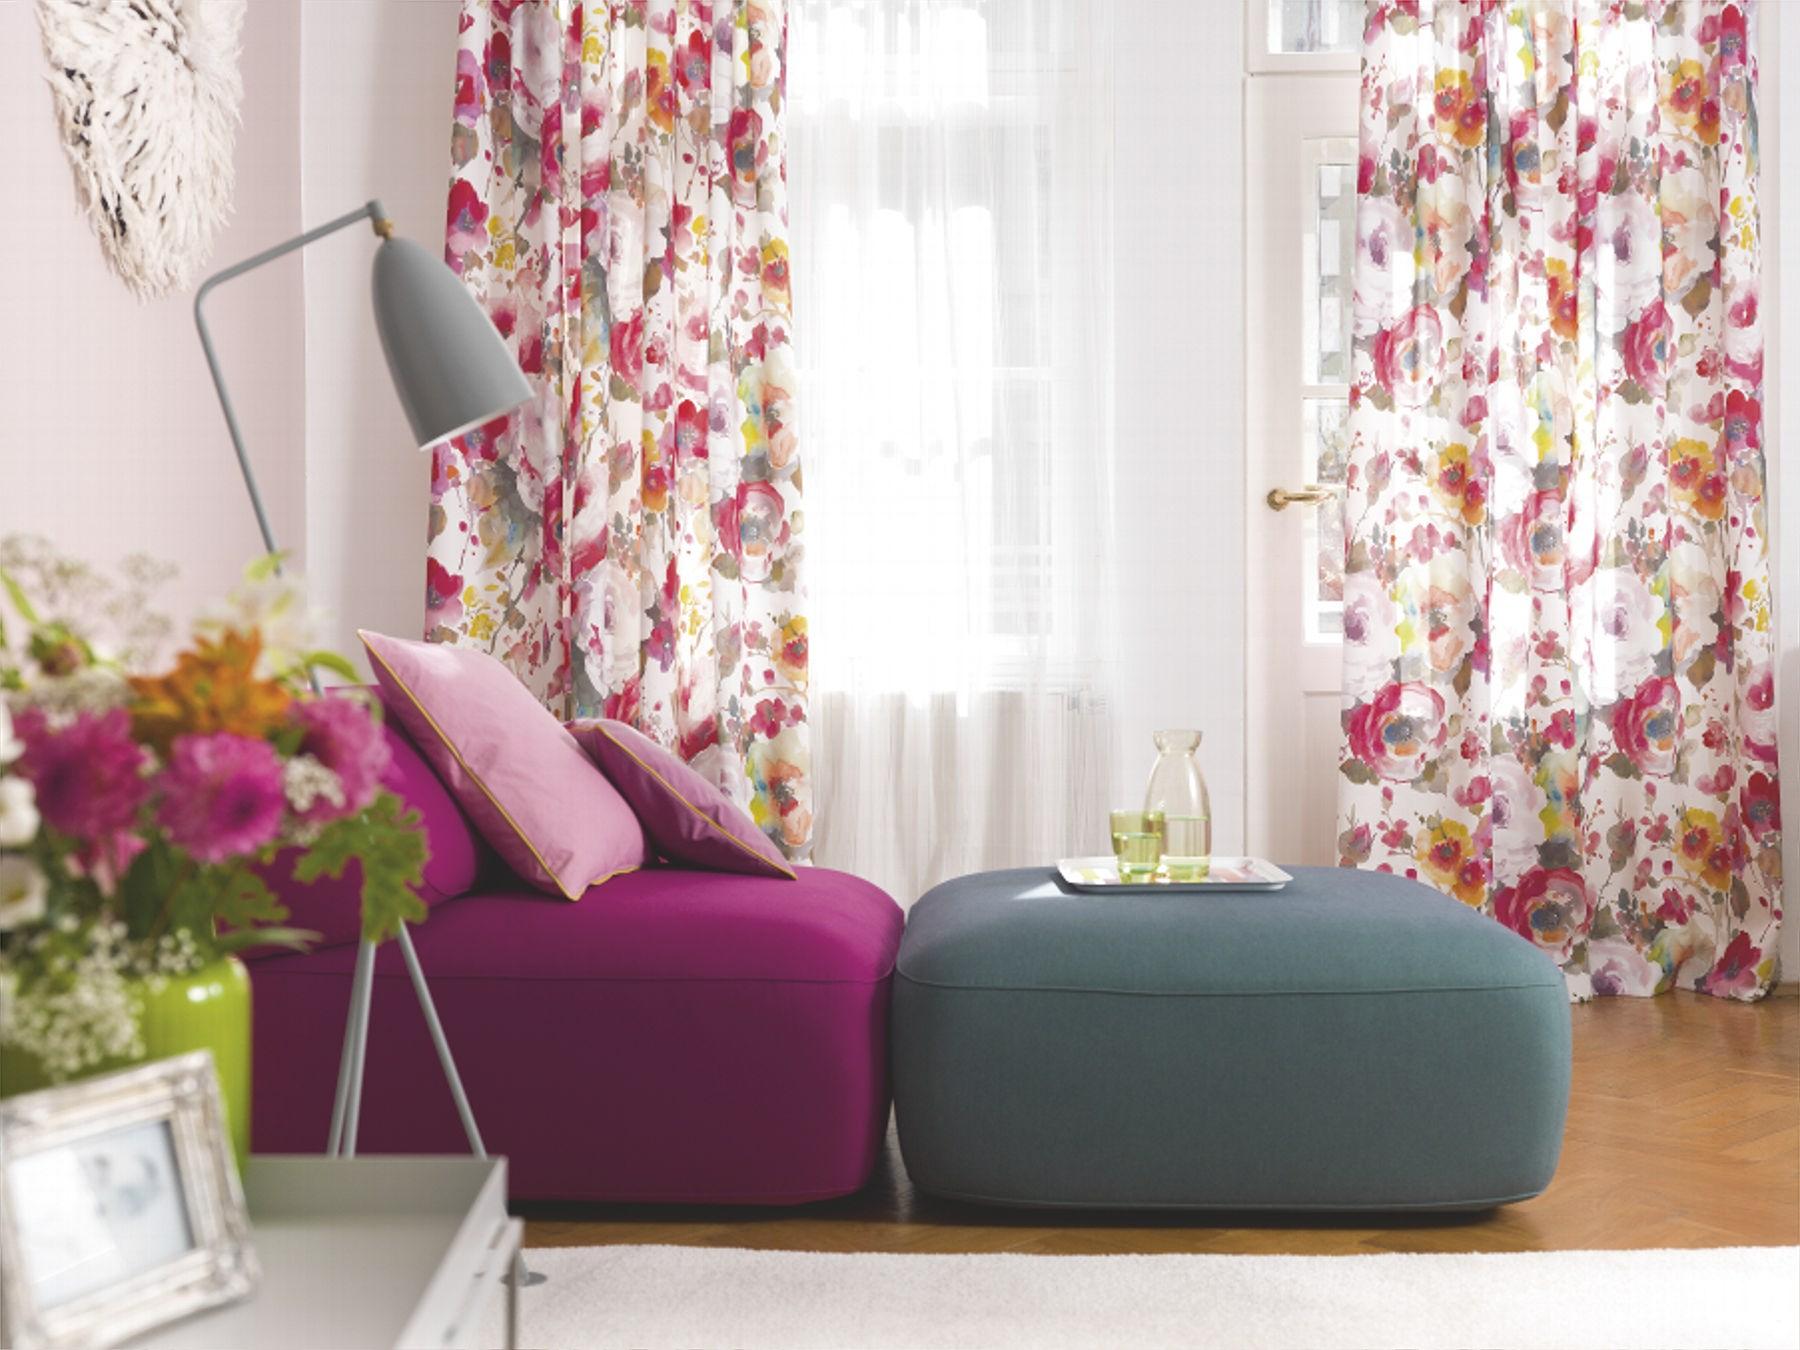 decoration fabric roses 1 8805 061 jab anstoetz fabrics. Black Bedroom Furniture Sets. Home Design Ideas